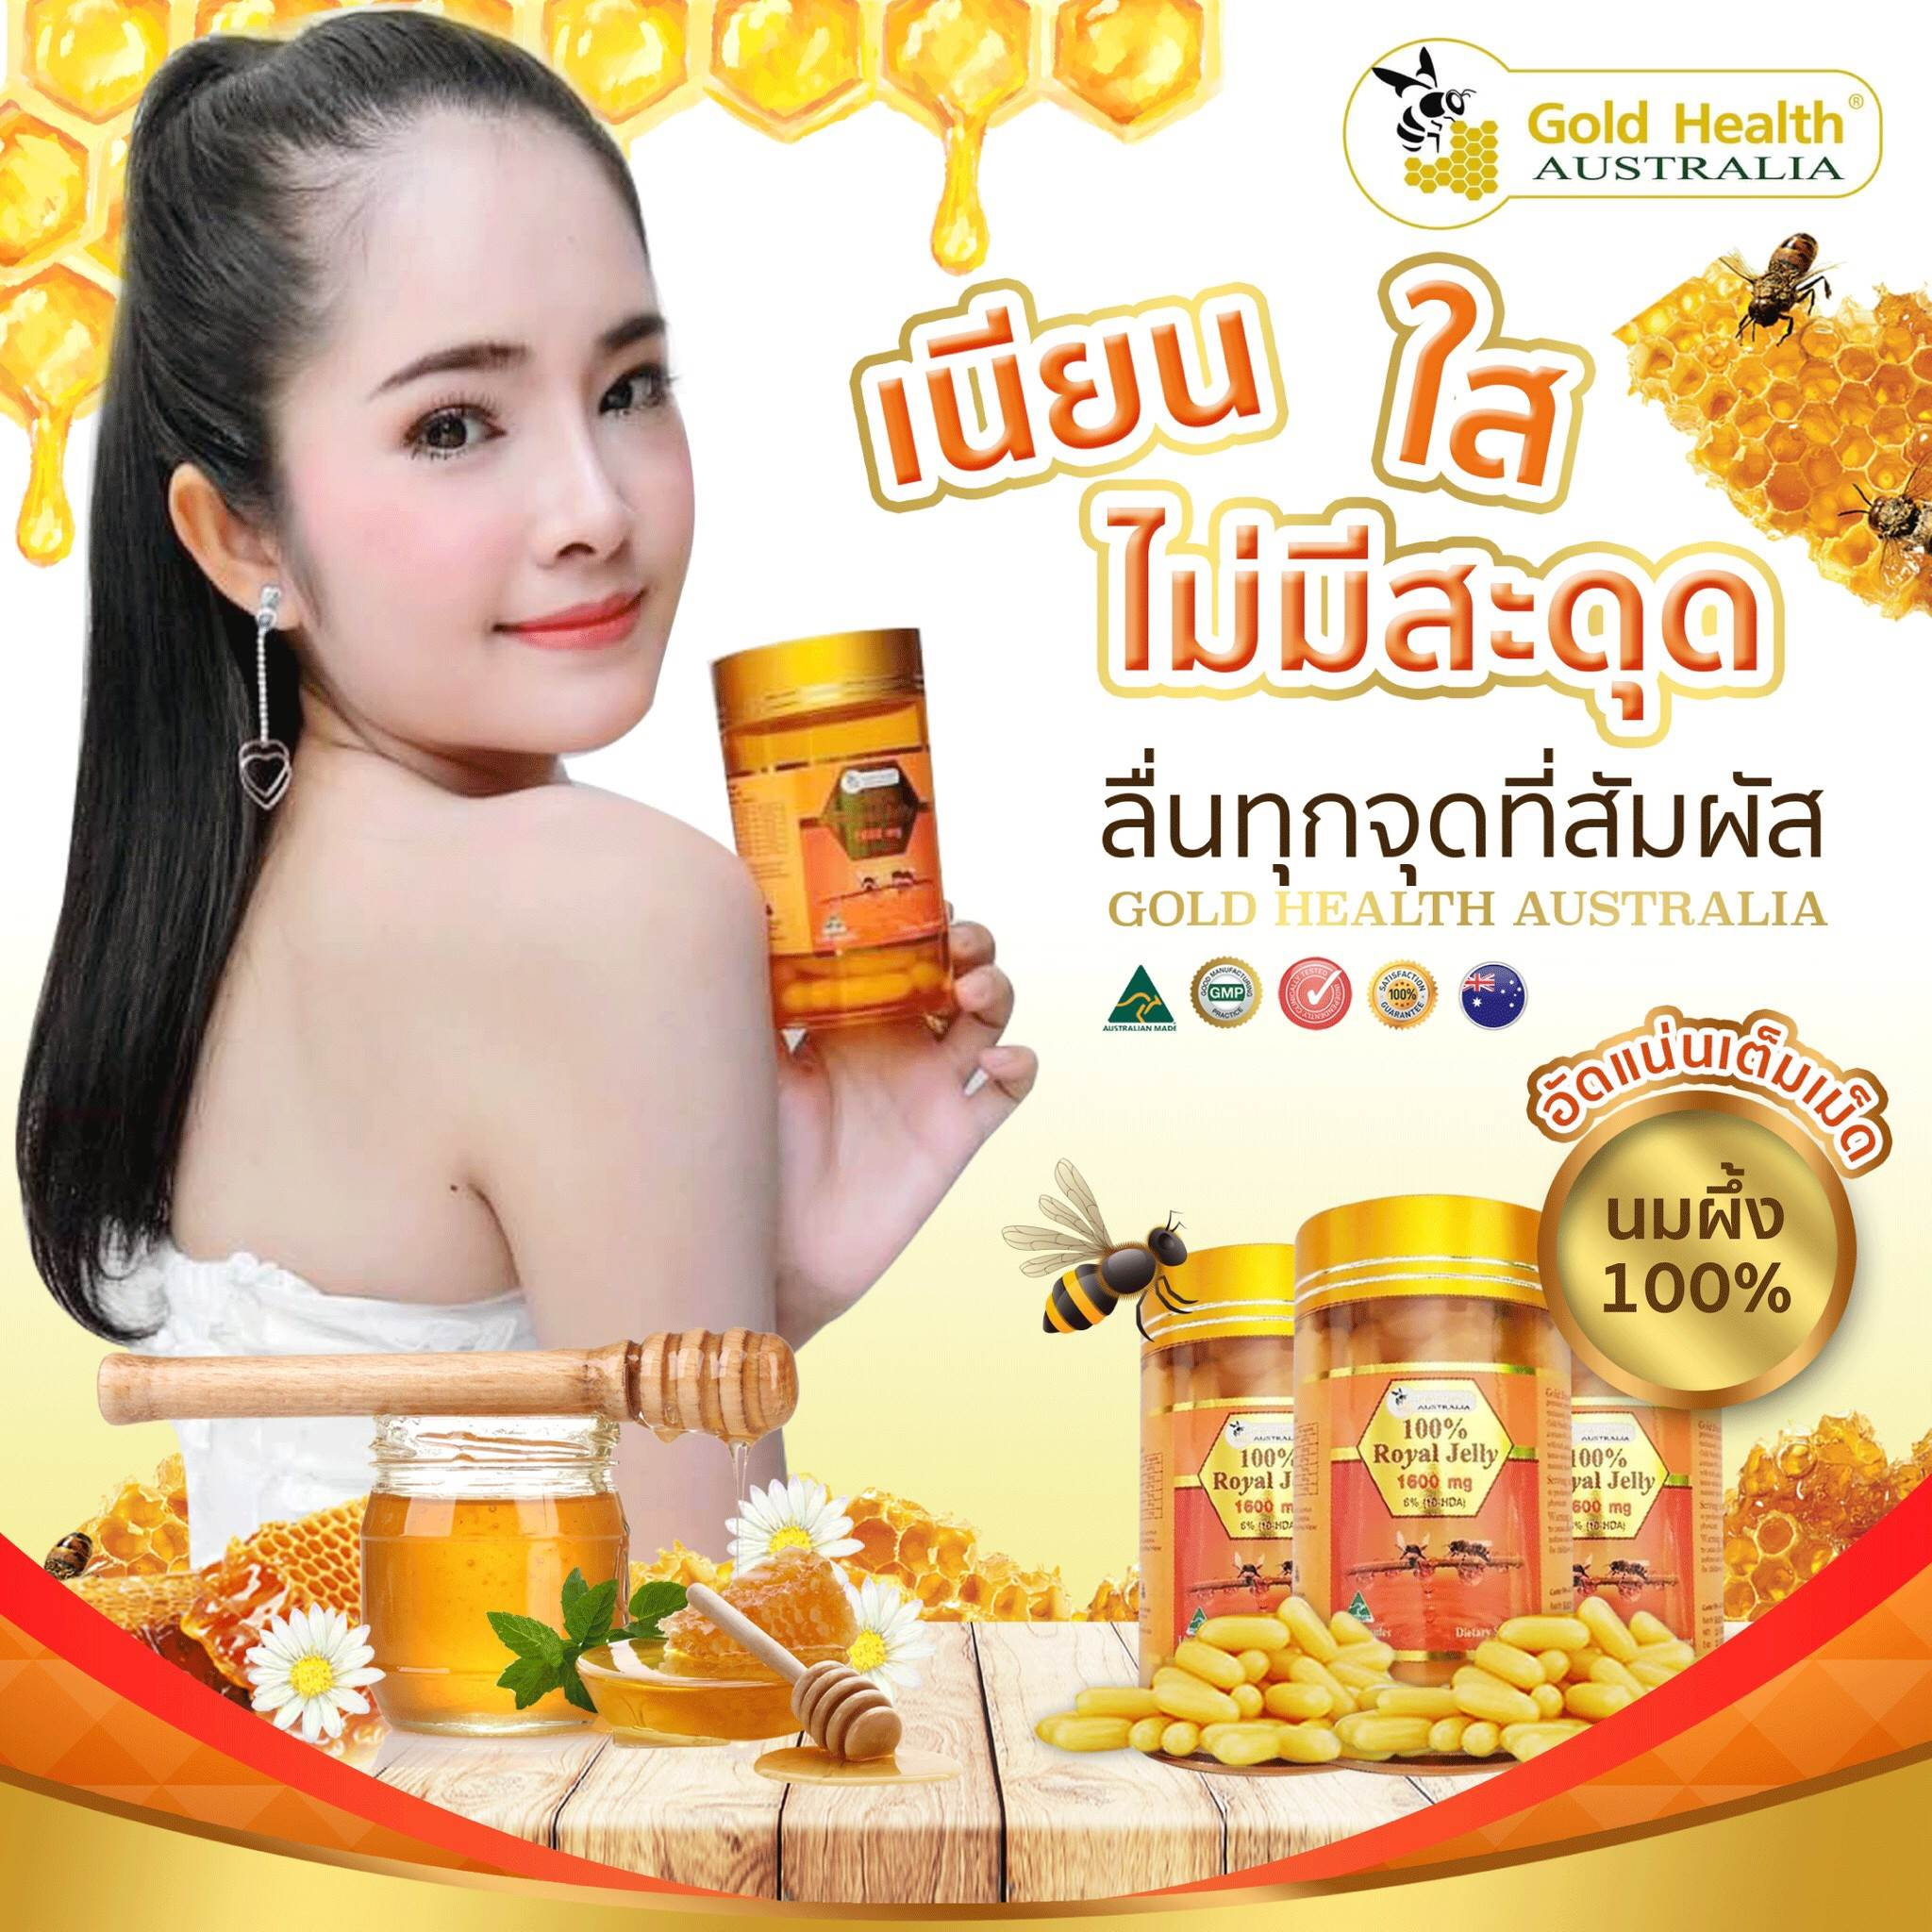 Gold Health Australia นมผึ้ง6% 1600mg 100เม็ด บำรุงผิว บำรุงสุขภาพ จากออสเตรเลีย